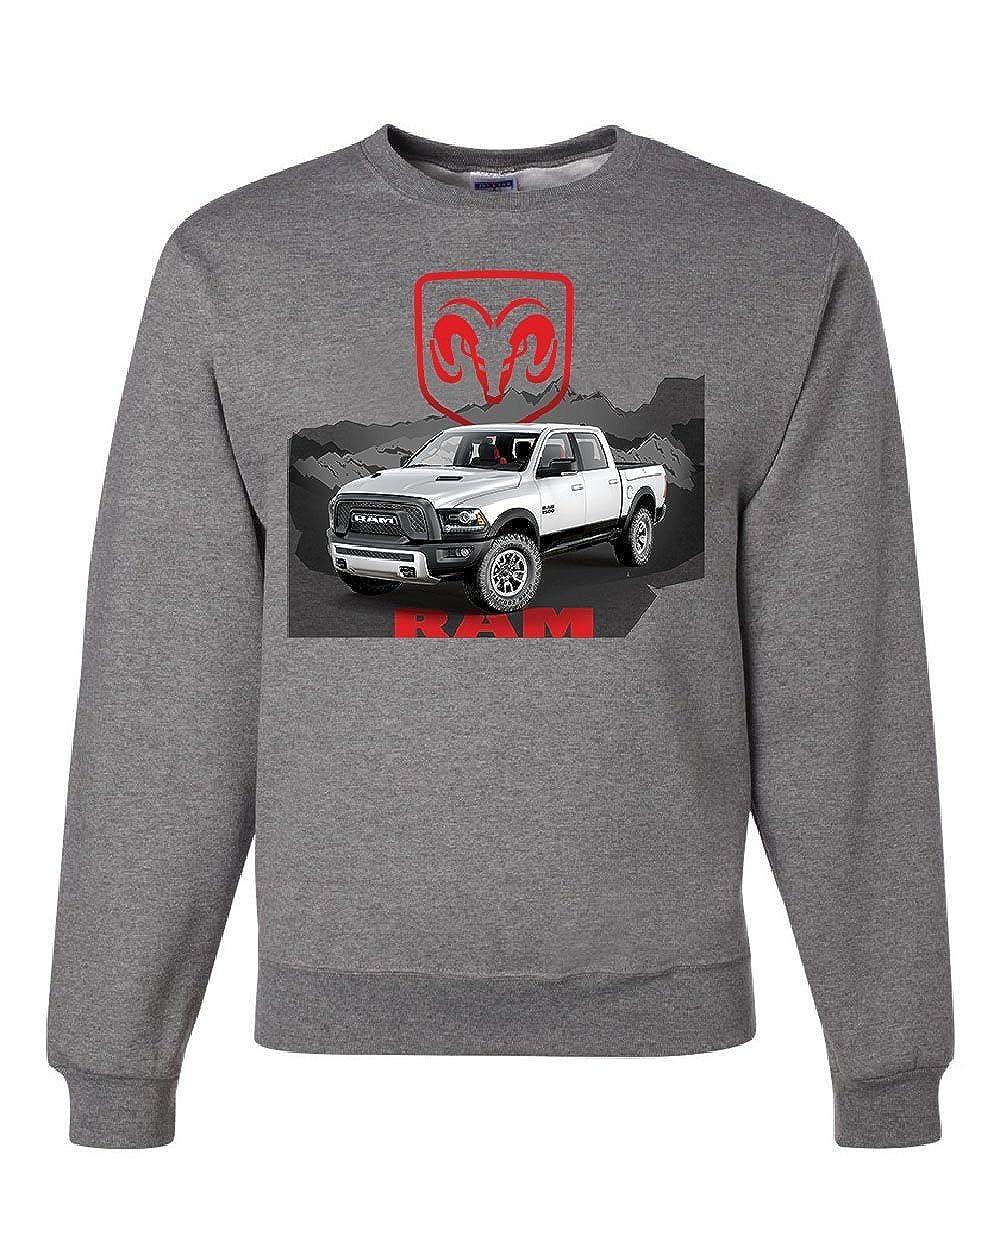 Tee Hunt Dodge RAM White Truck Sweatshirt Heavy Duty Pickup Truck Sweater